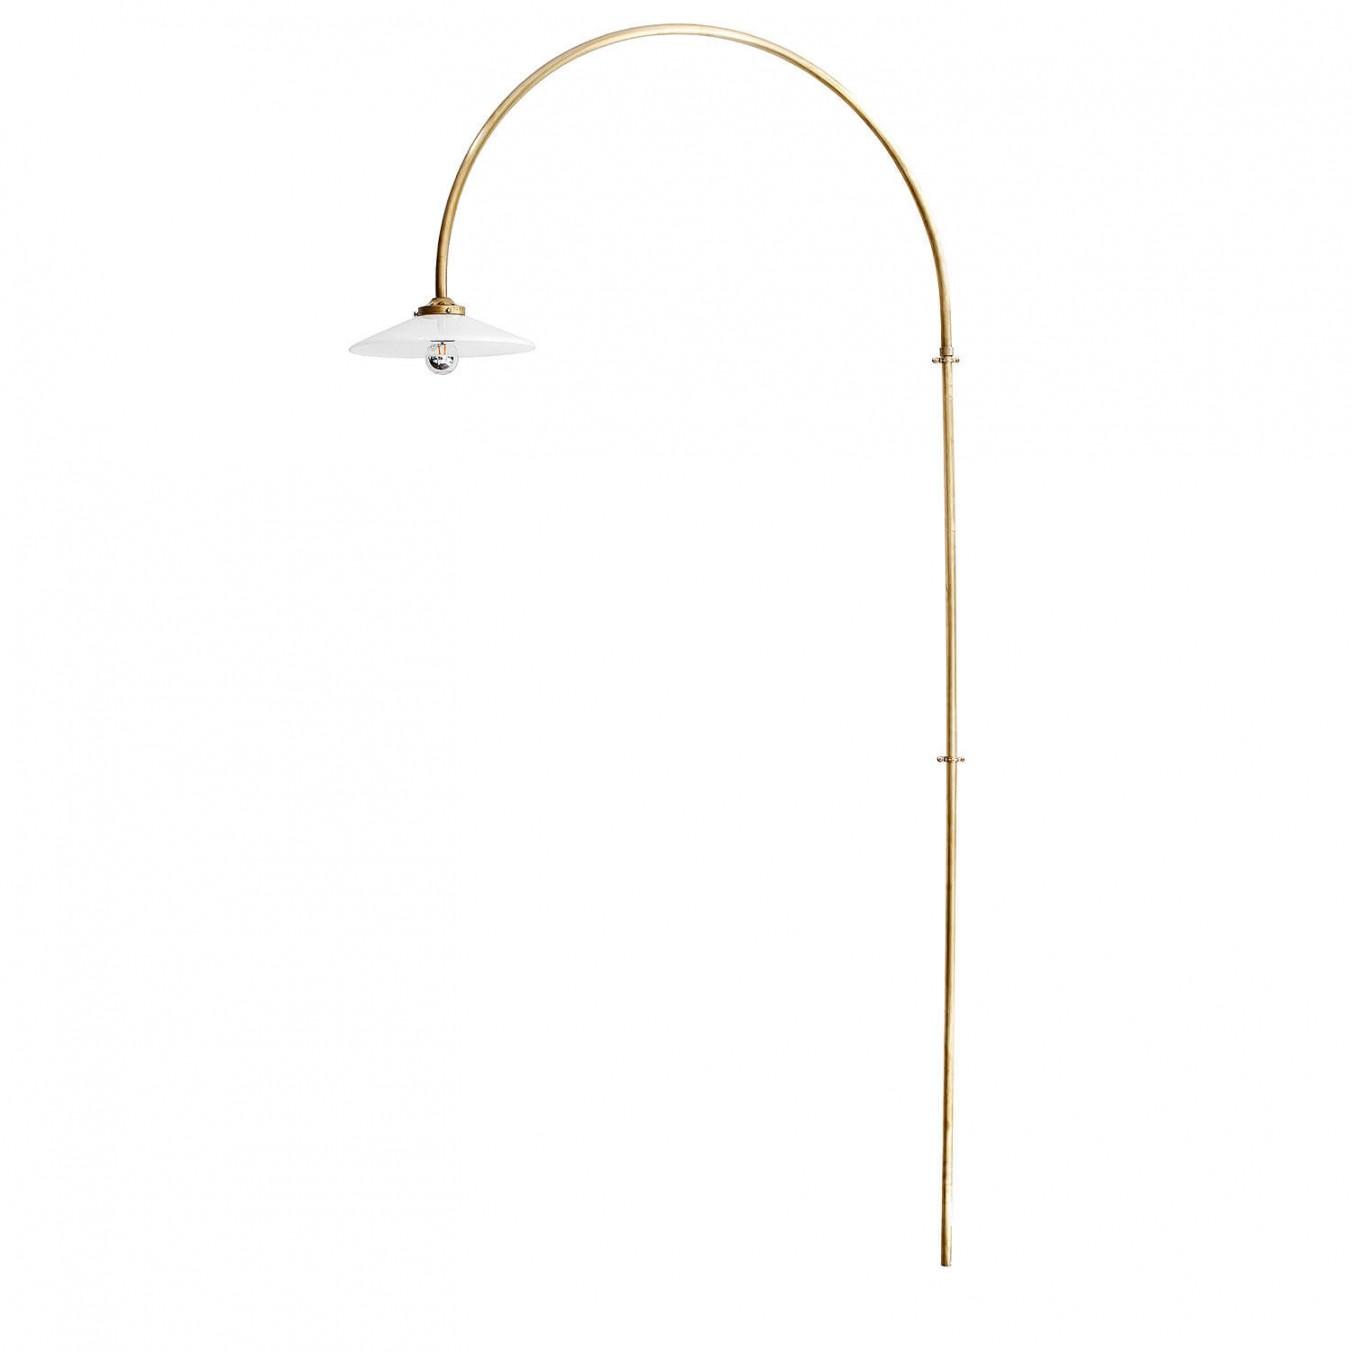 Hanging Lamp n°2